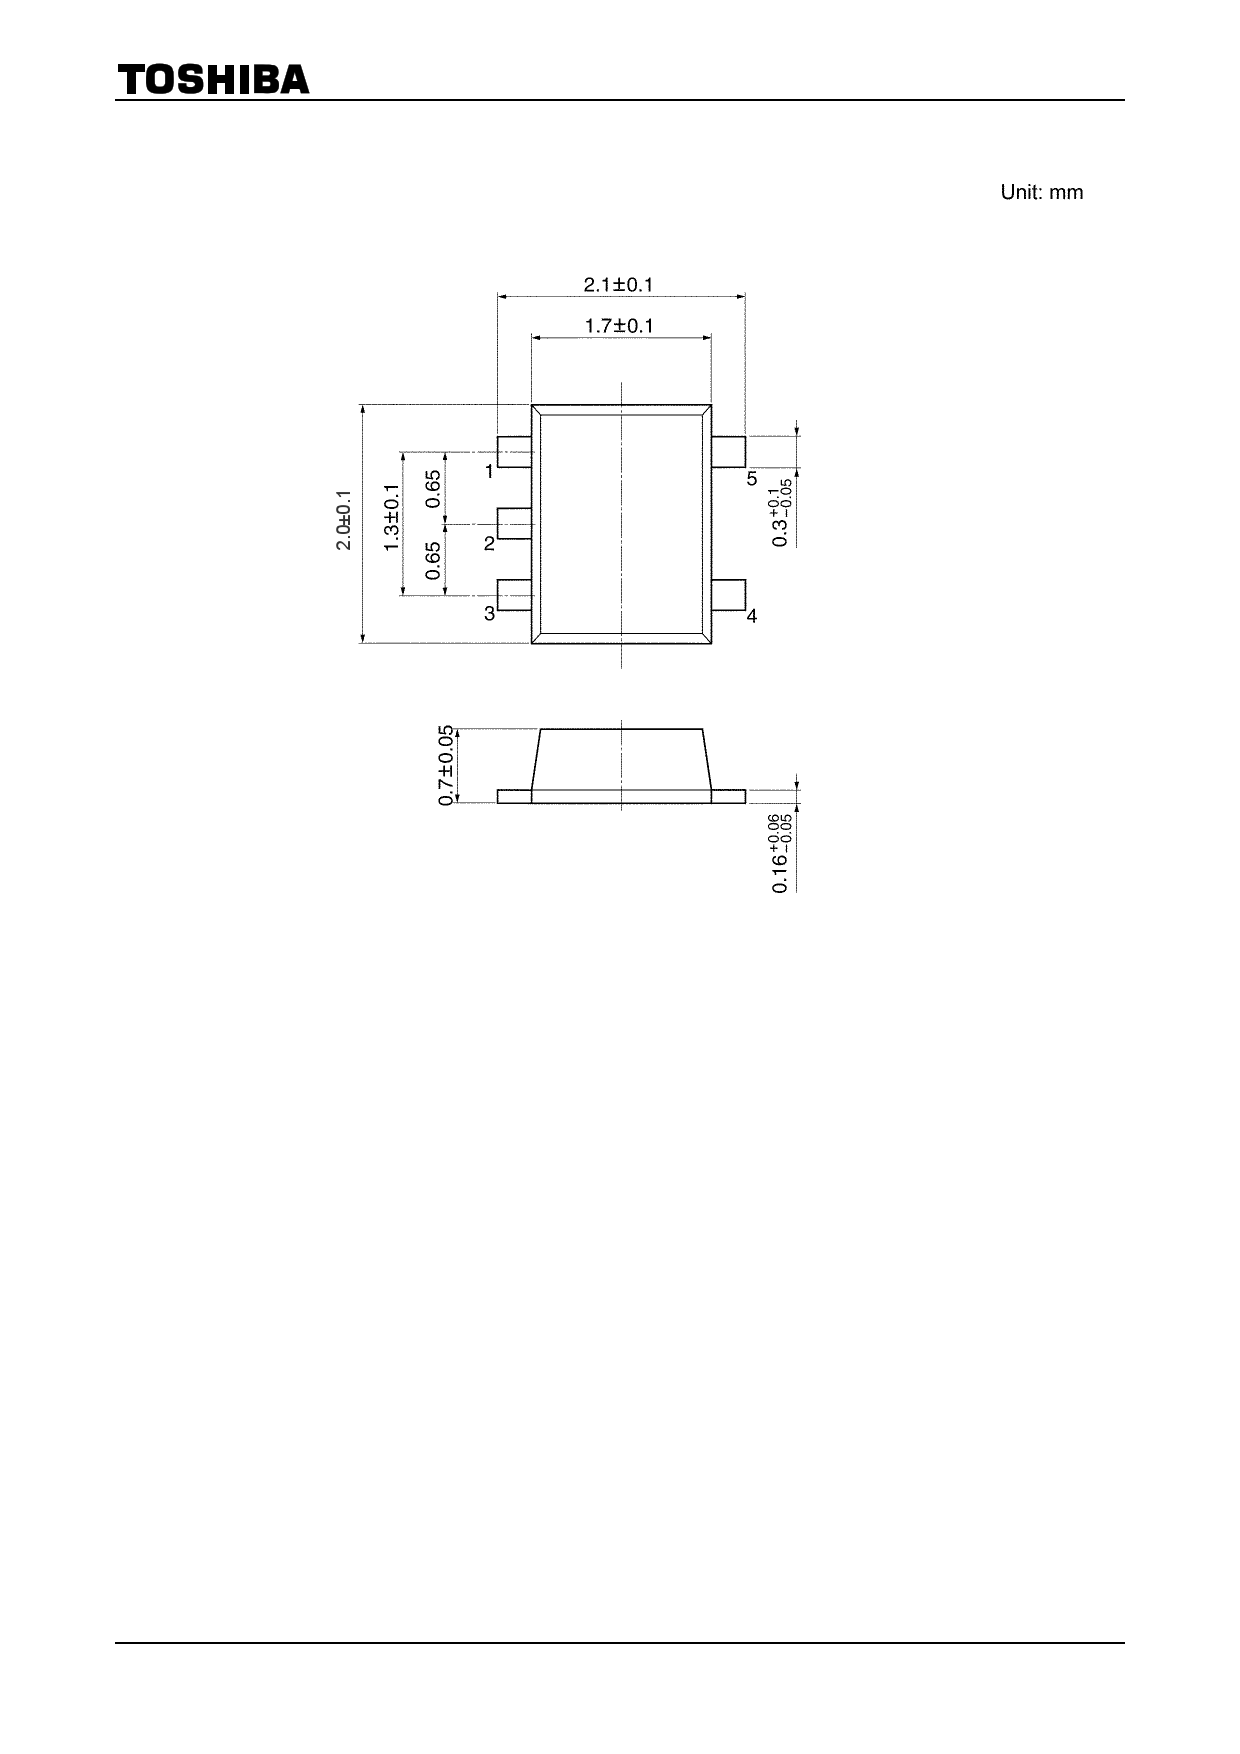 TCS10SLU pdf, 반도체, 판매, 대치품